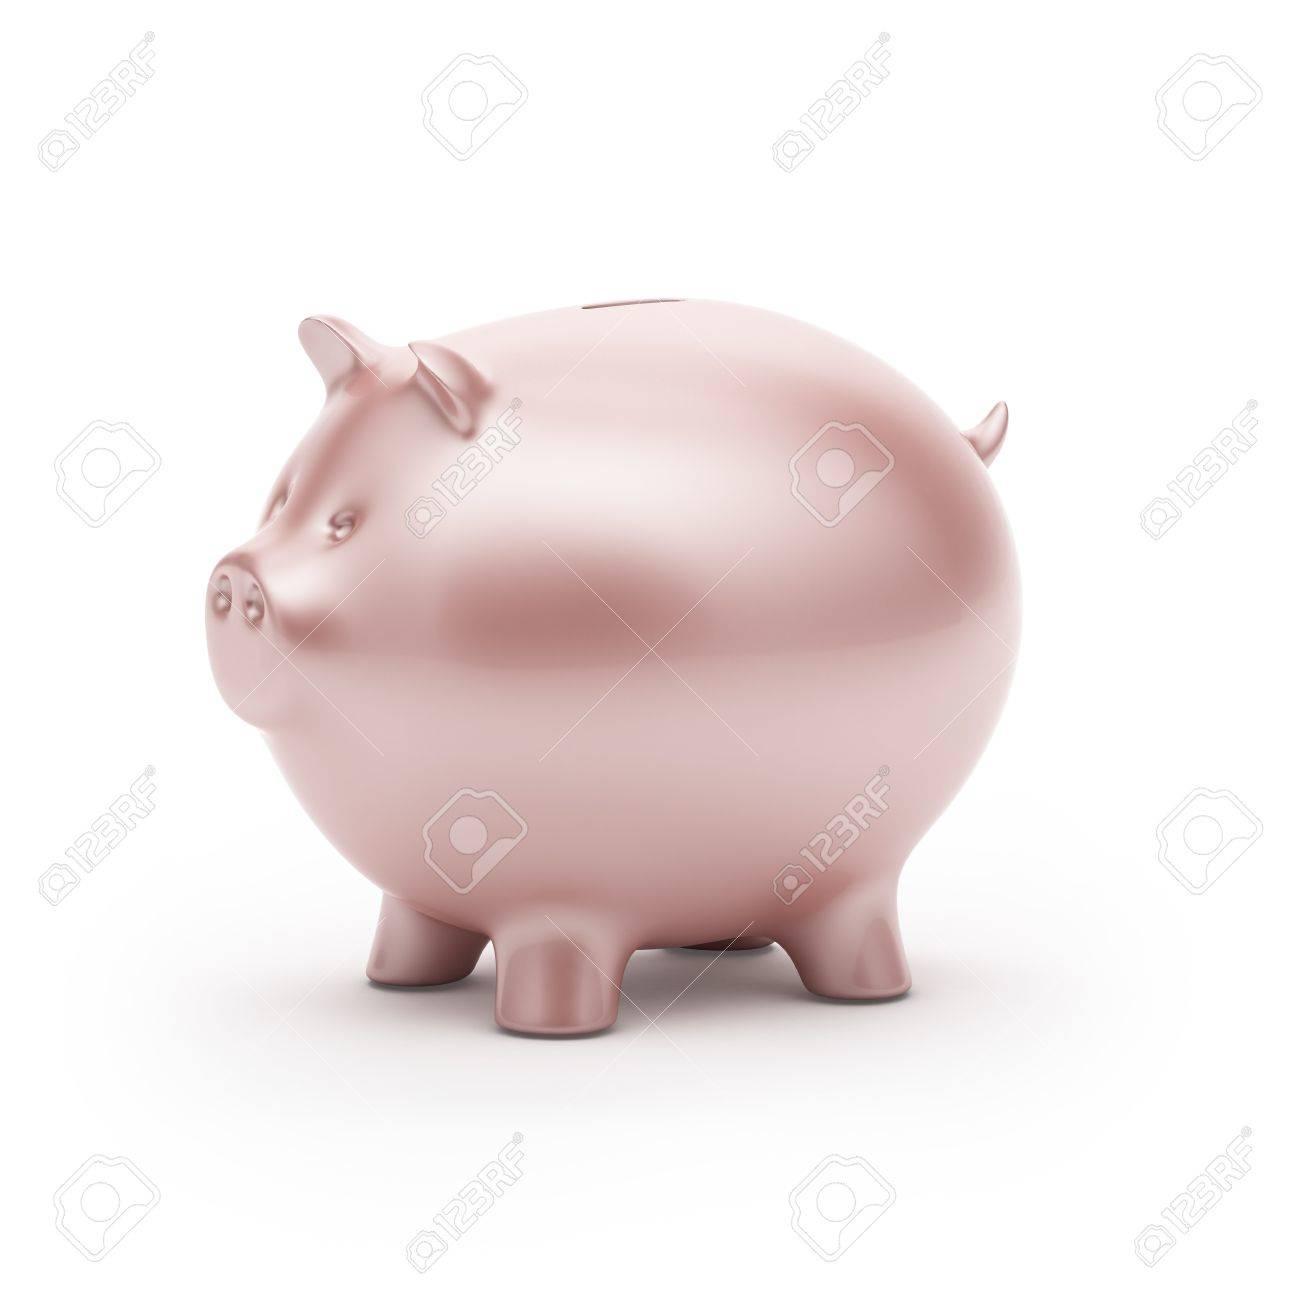 Piggy bank Stock Photo - 16318040